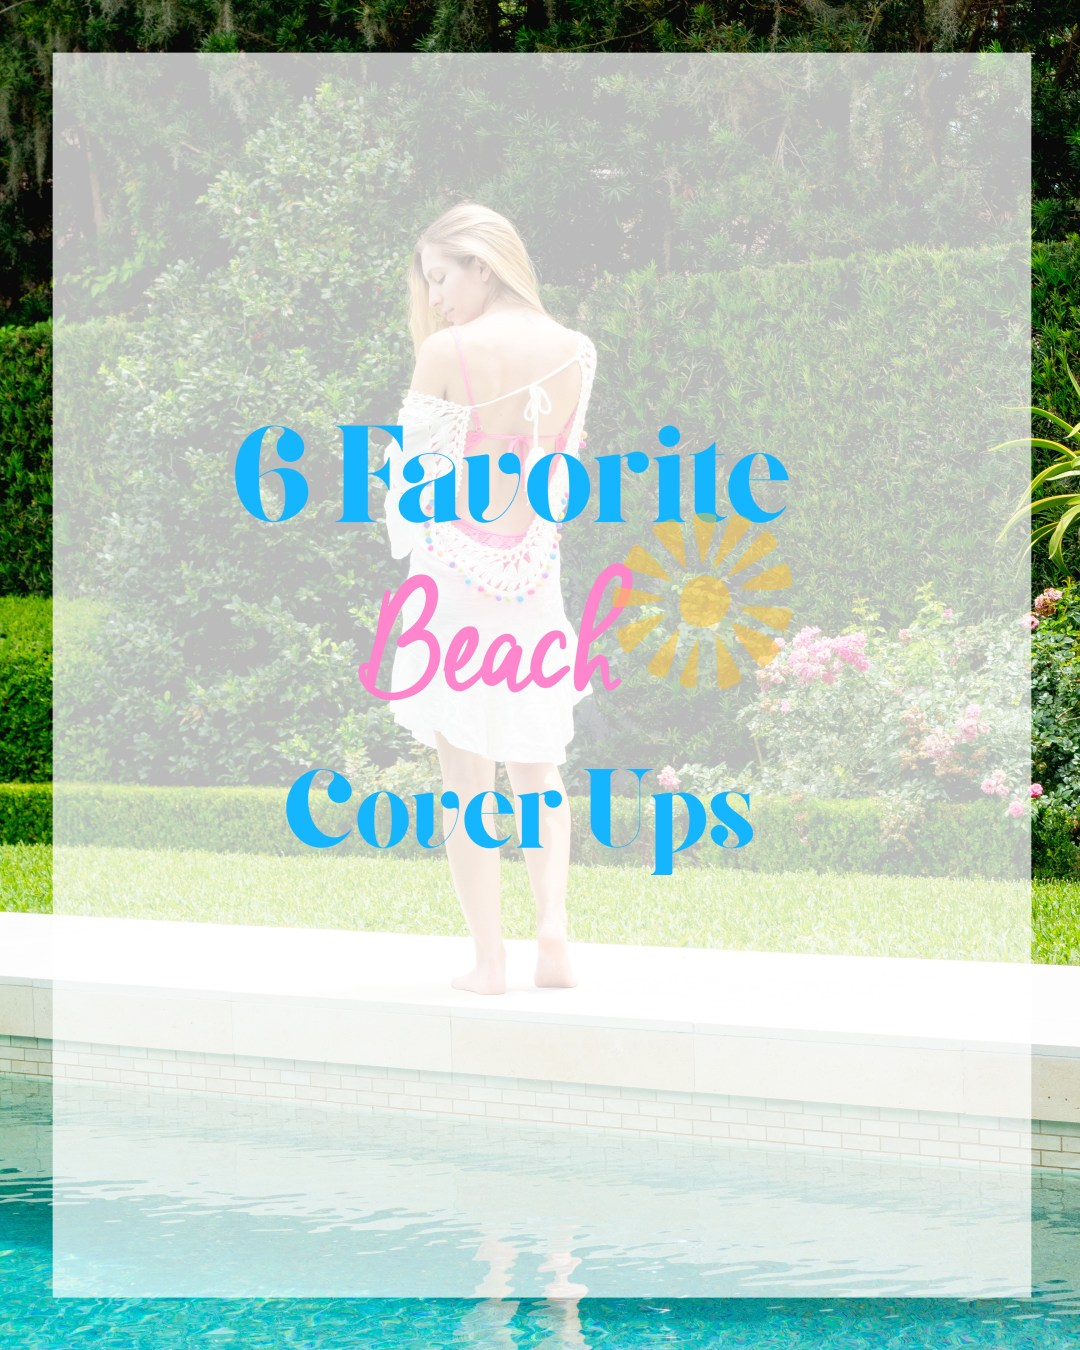 FAVORITE BEACH COVER UPS